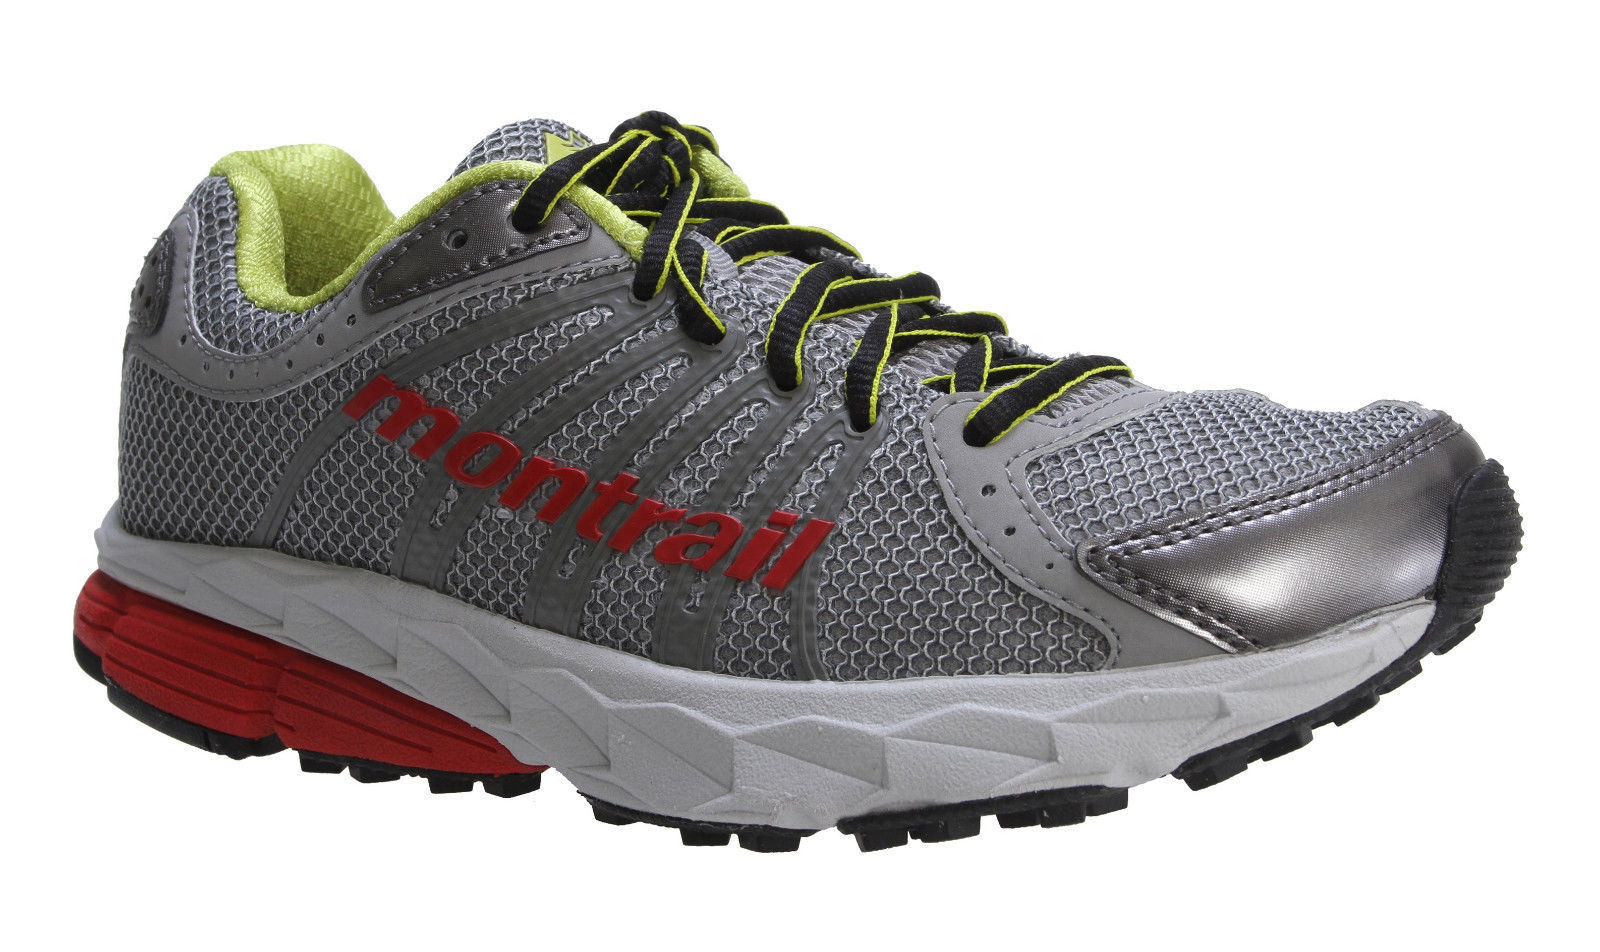 NEW Womens Montrail FluidBalance Retail Trail Running Shoes Grey Icy/Juicy Retail FluidBalance $100 67c2f9